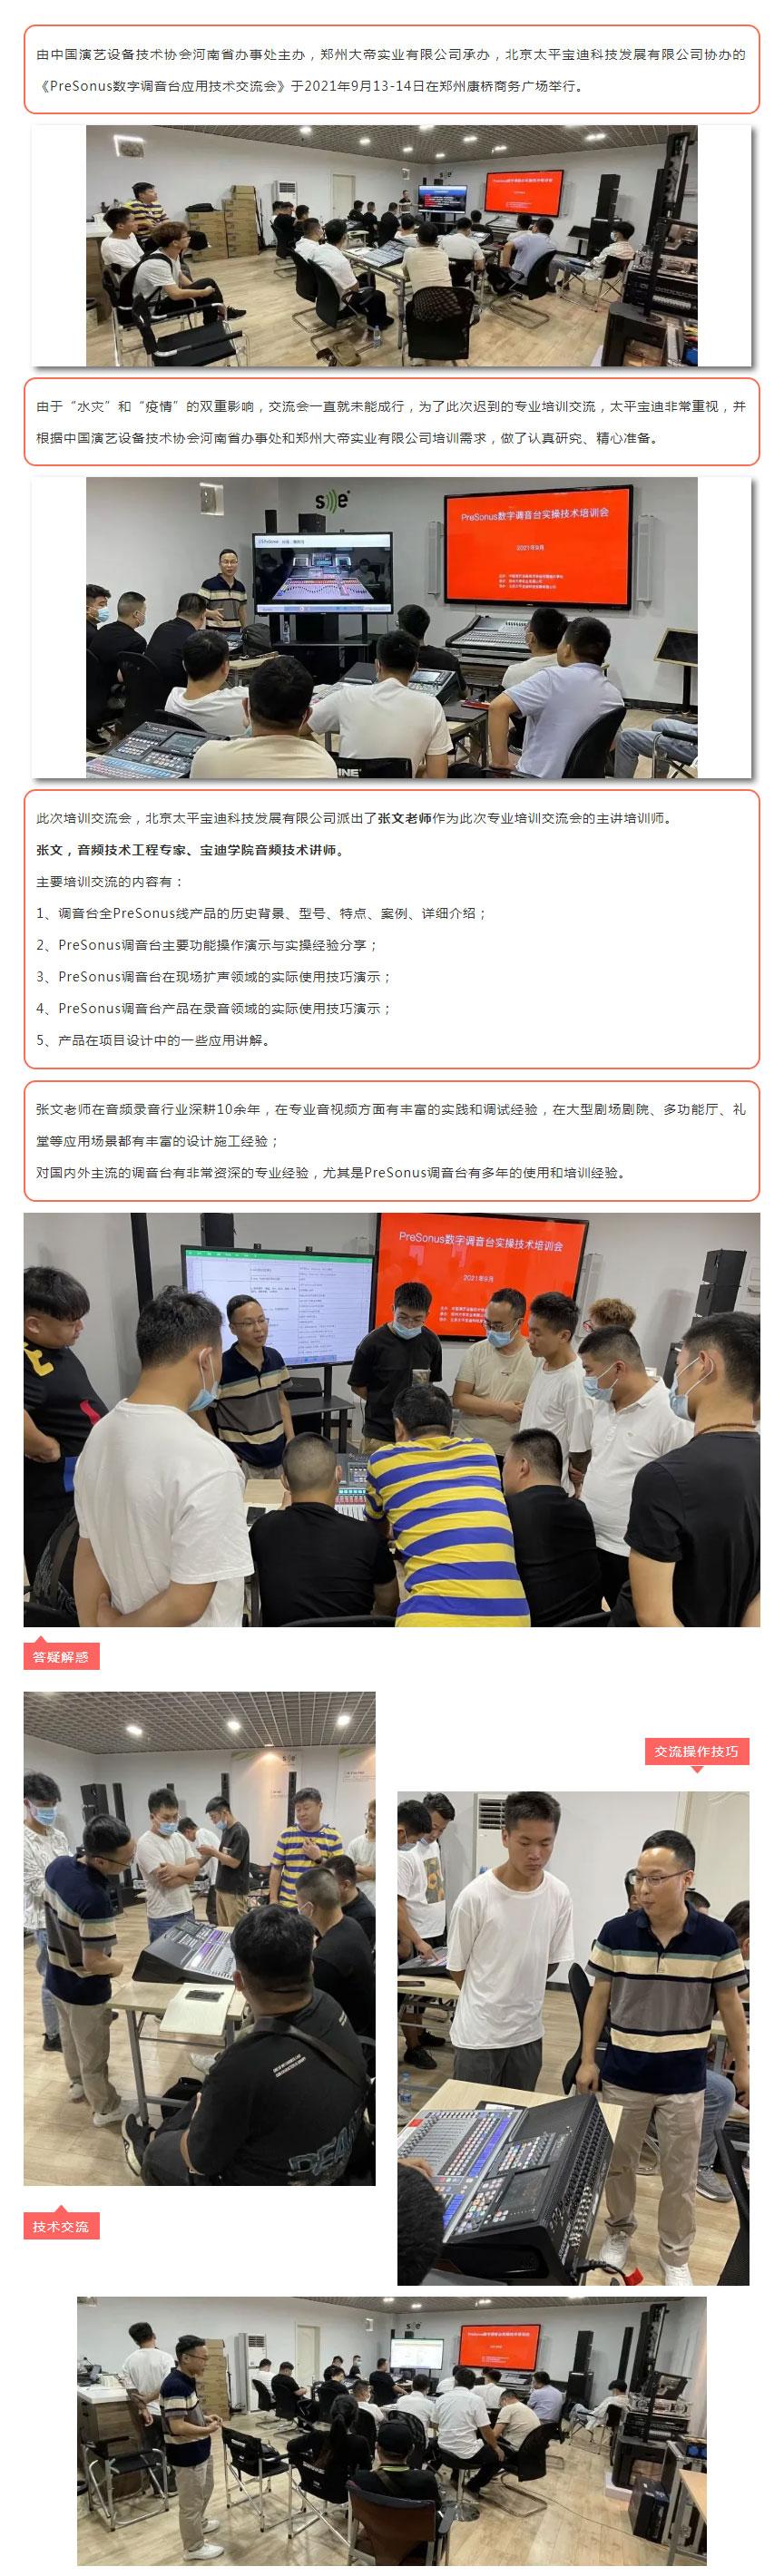 PreSonus数字调音台应用技术培训交流会在郑州举行_01.jpg